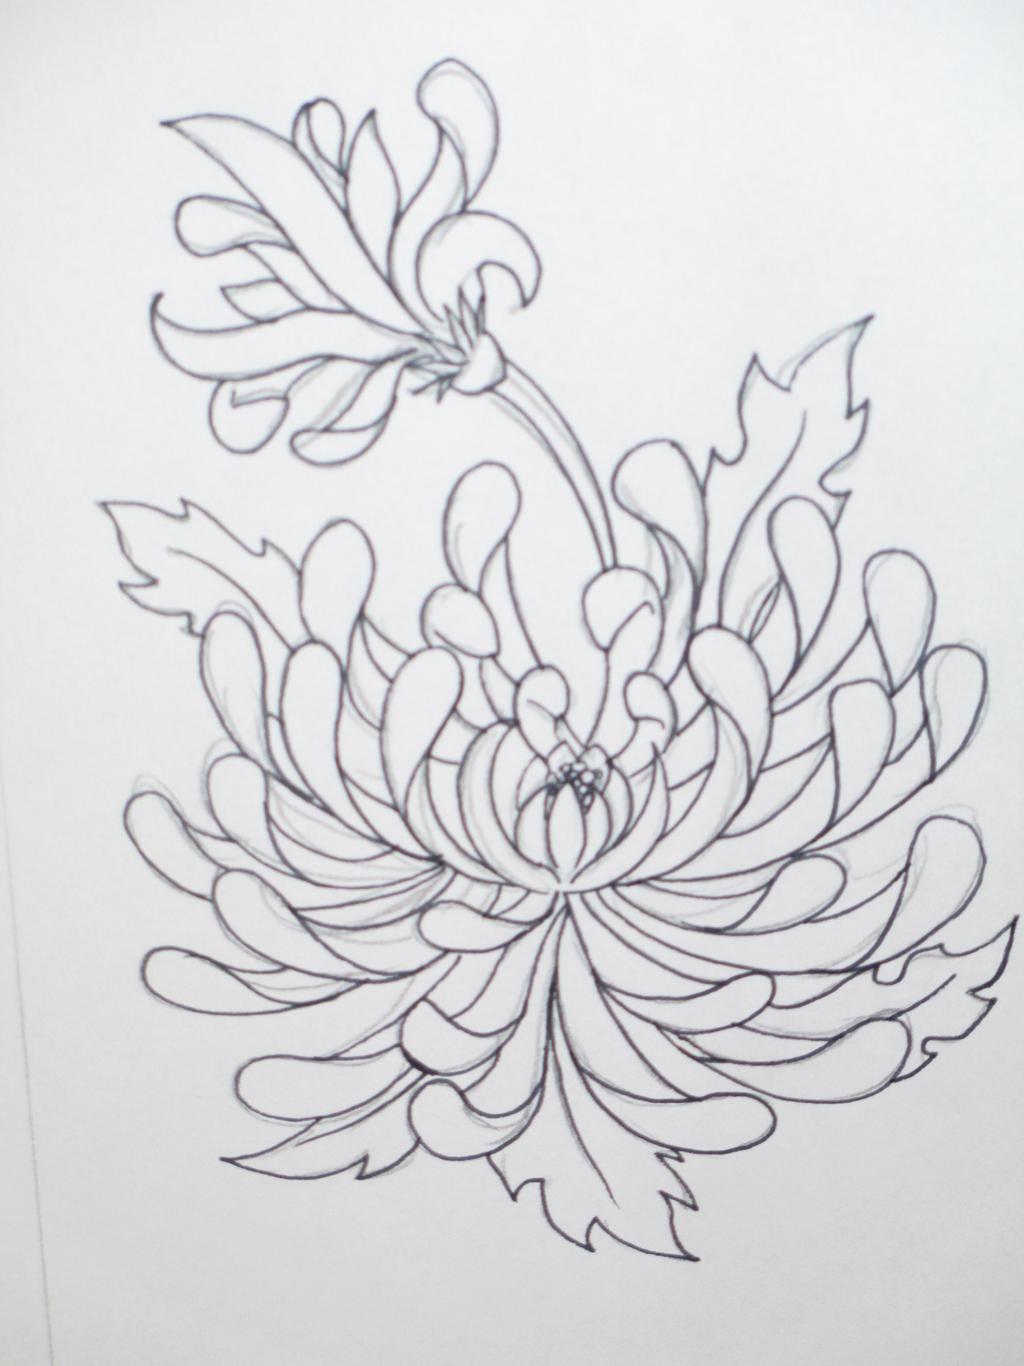 Chrysanthemum Flower Line Drawing : Chrysanthemum line art by melmo on deviantart